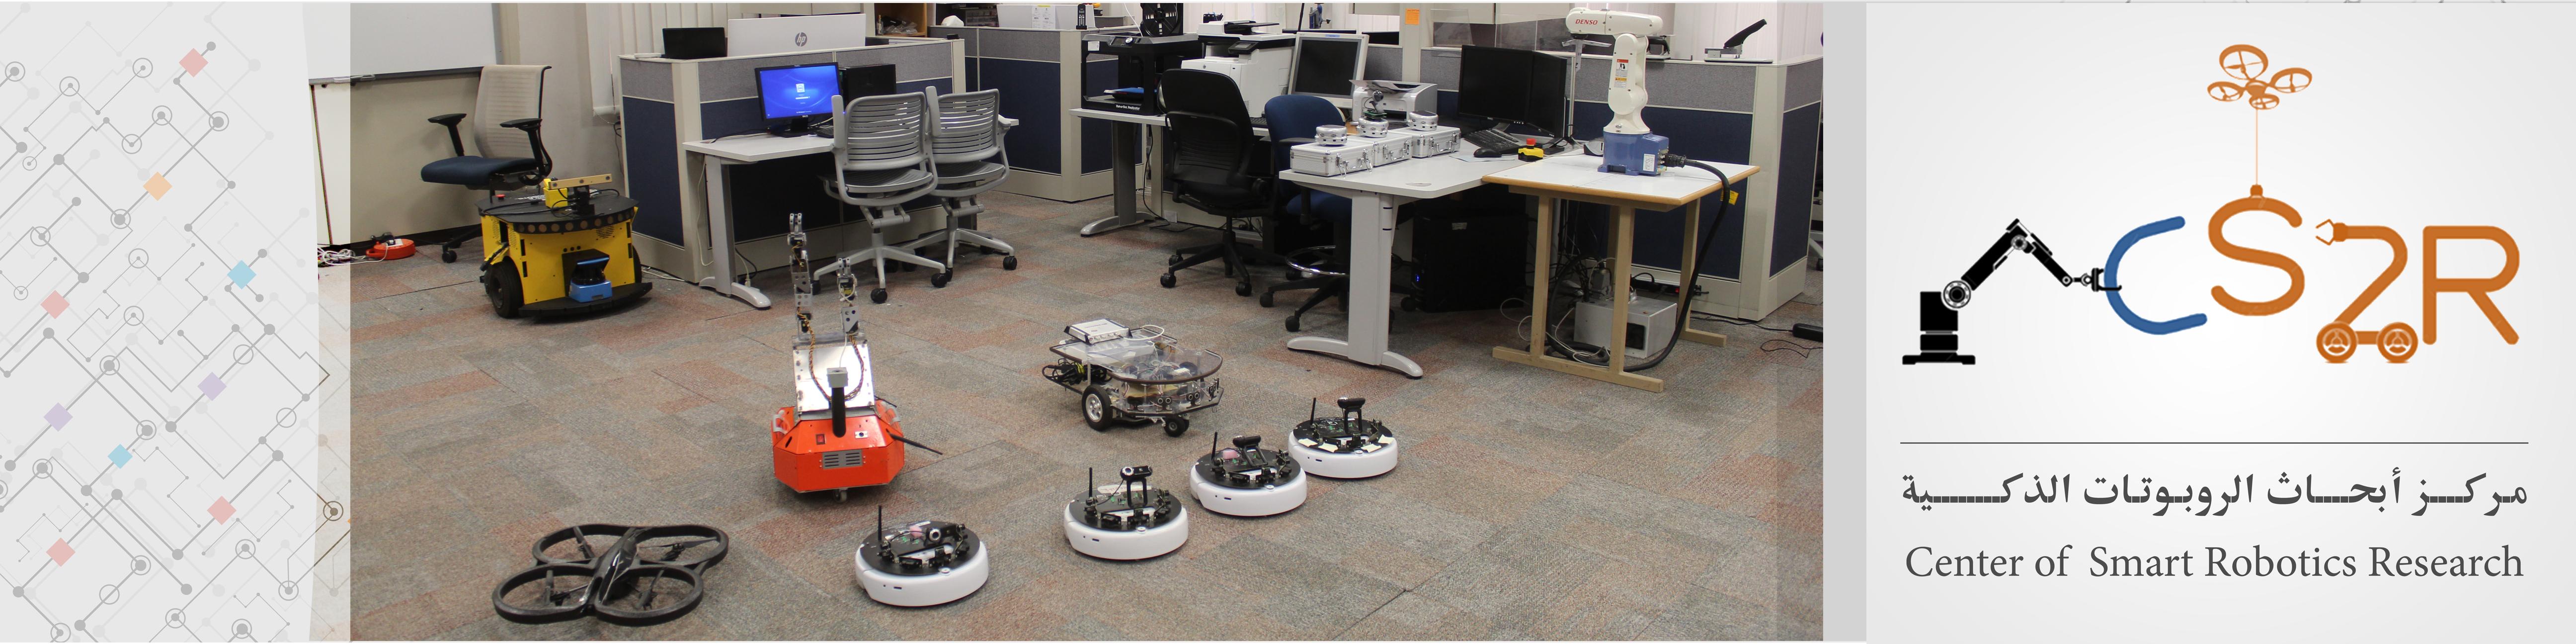 مركز ابحاث الروبوتات الذكية - مركز ابحاث الروبوتات الذكية